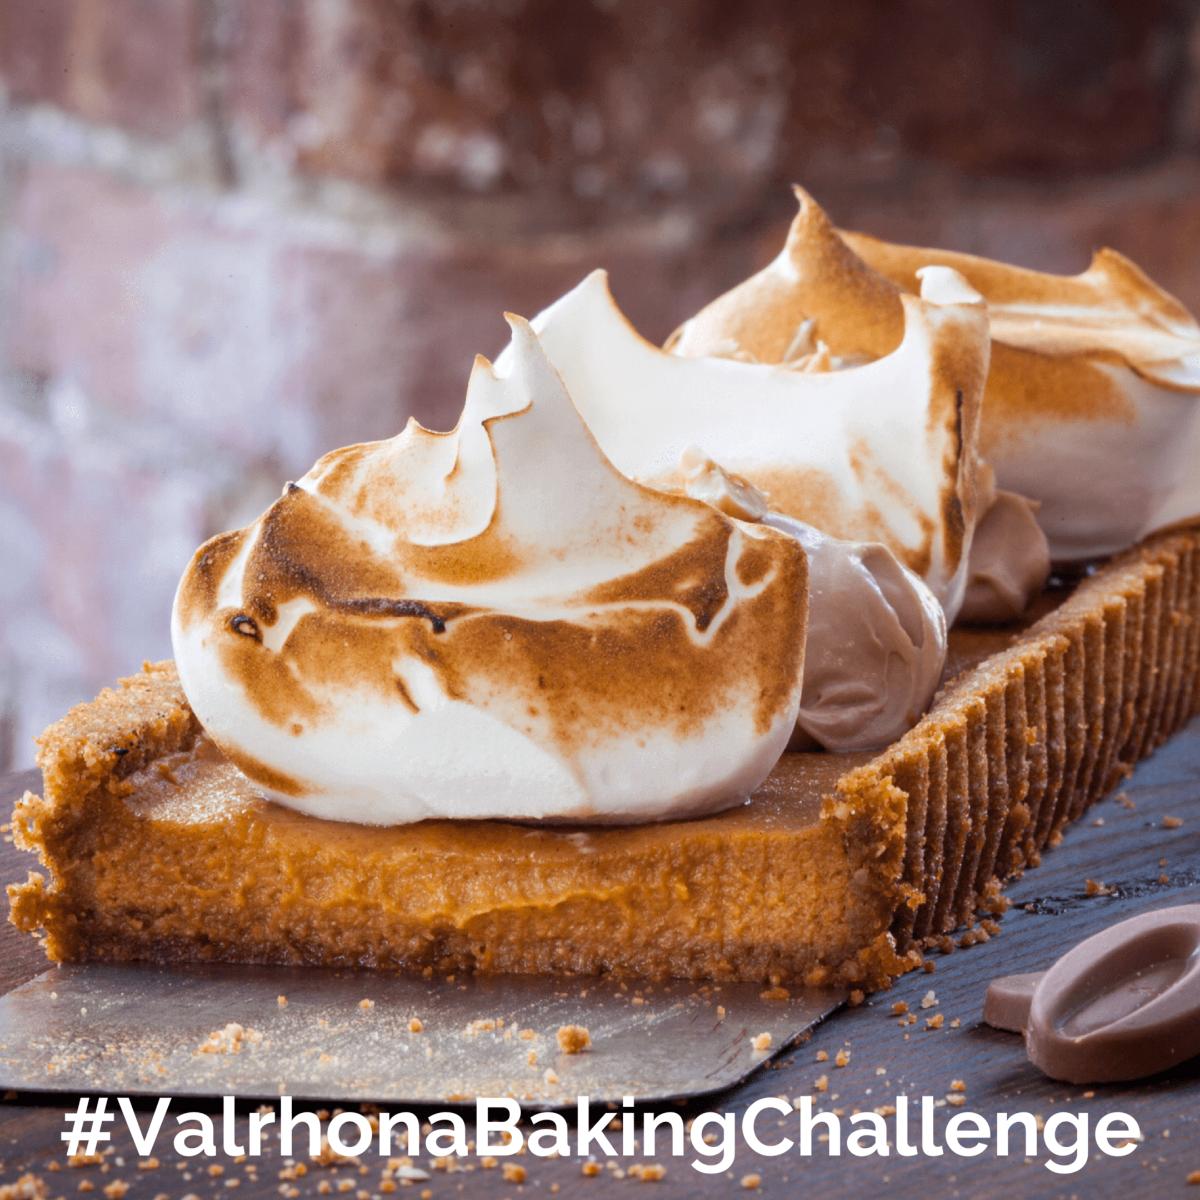 ValrhonaBakingChallenge #12 Announcment – Fall Recipes